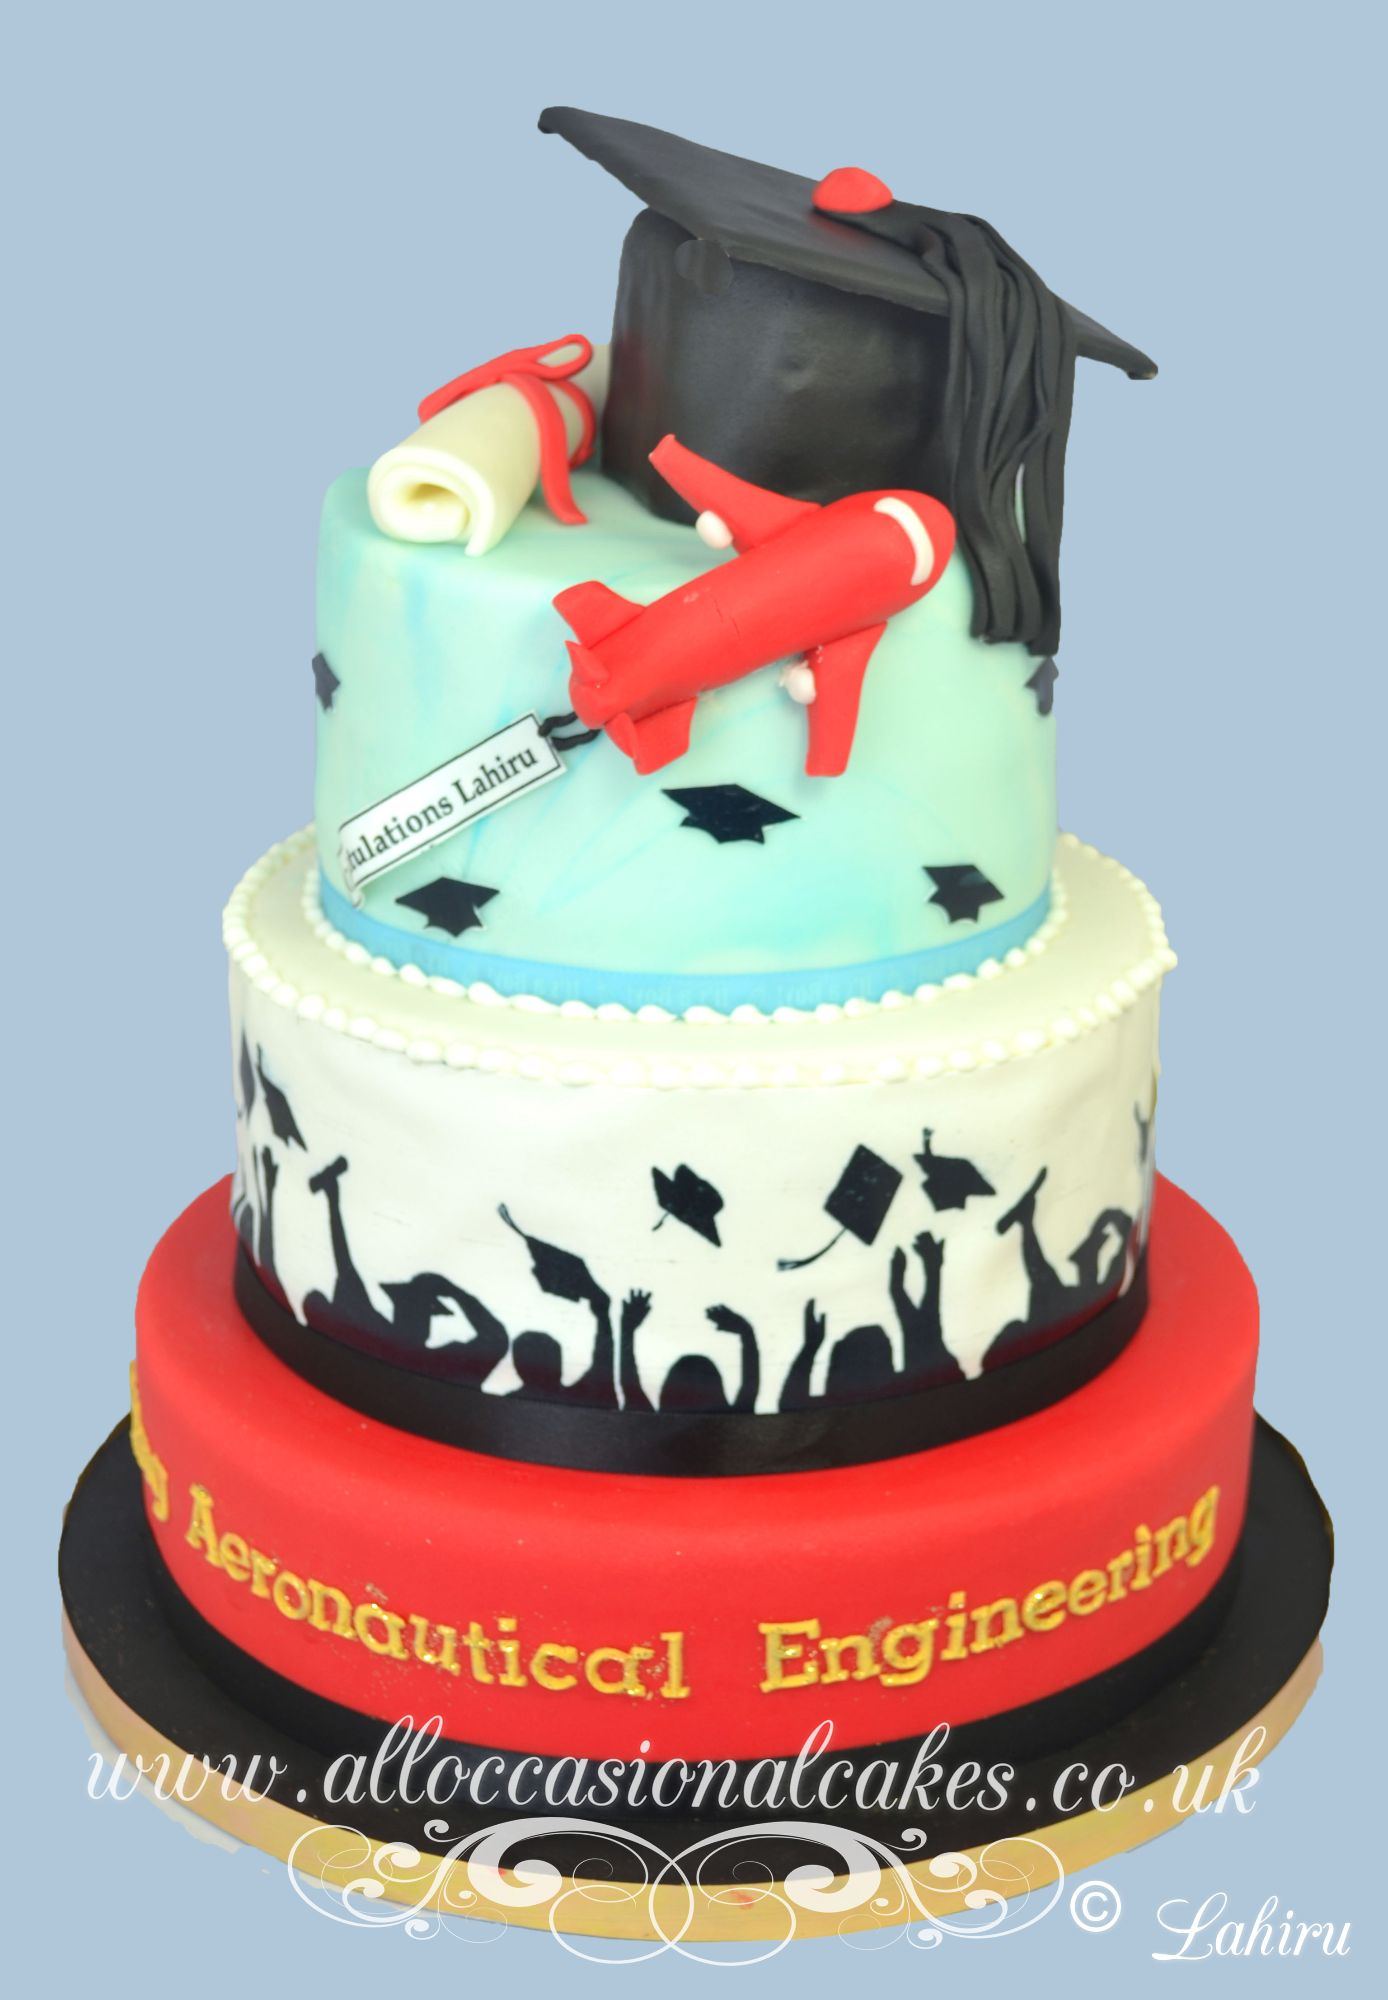 Professional Cake Designers Bristol Uk